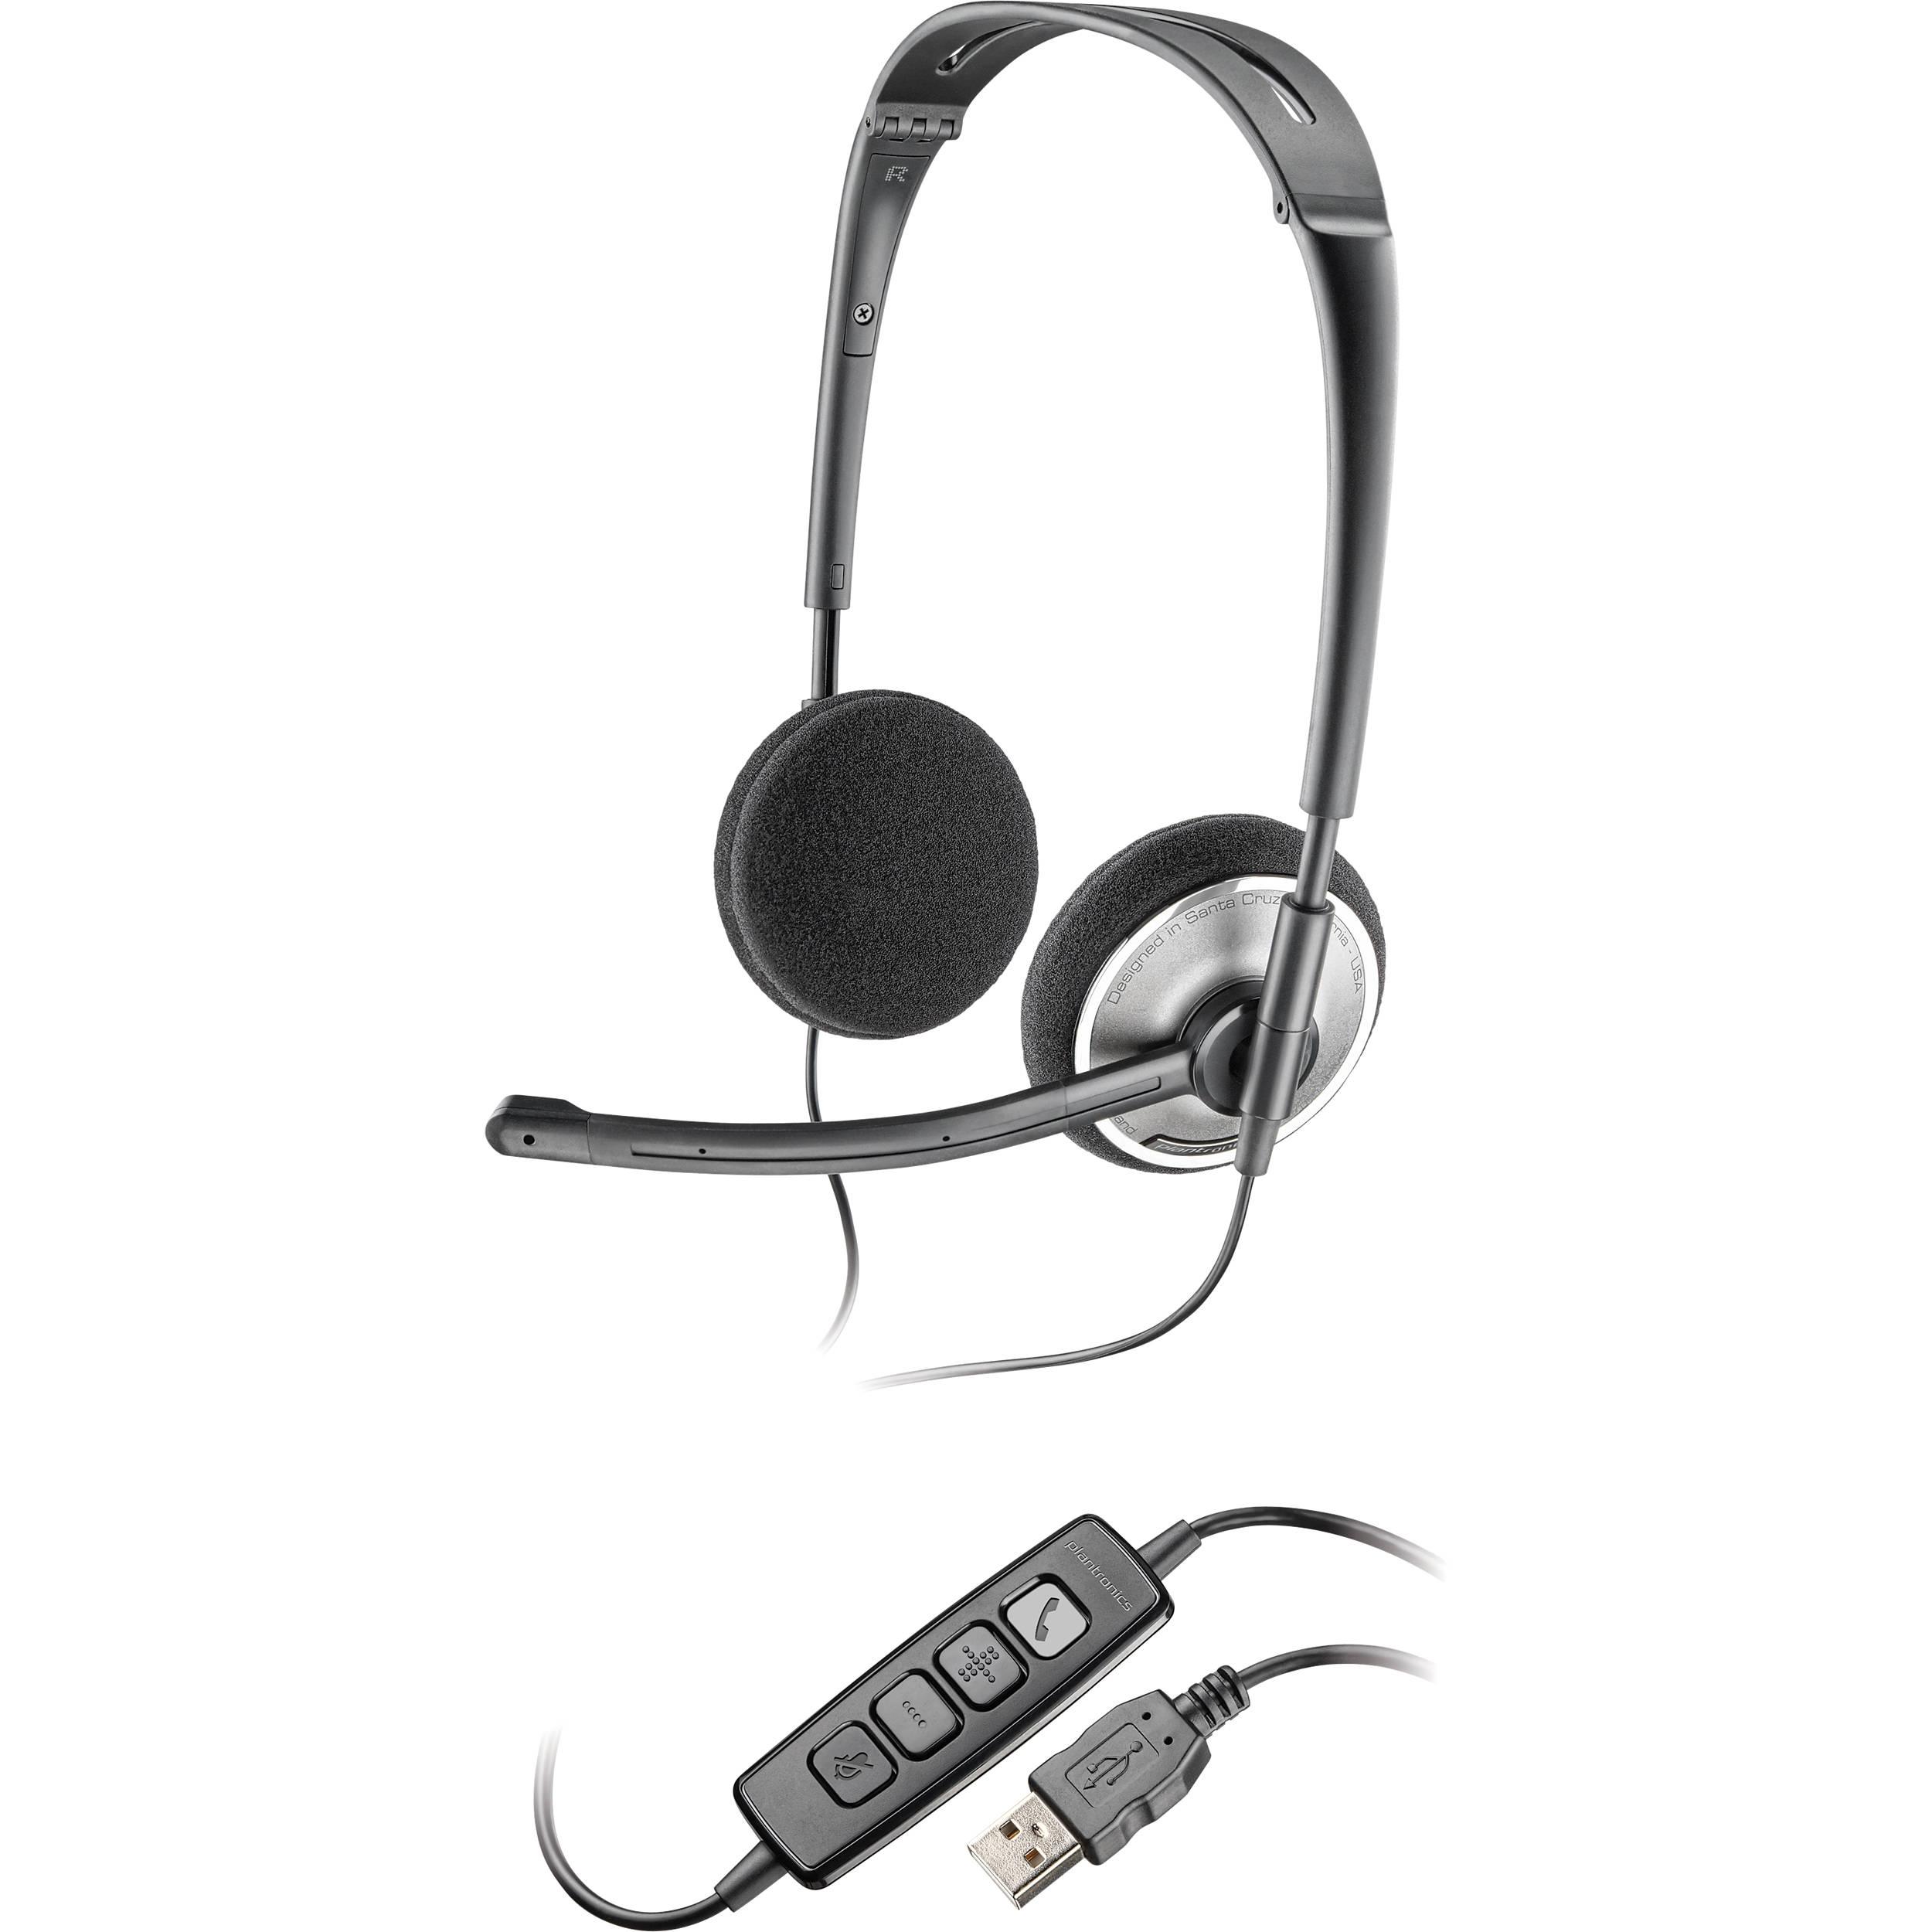 Plantronics Audio 478 Folding Usb Headset 81962 21 B H Photo